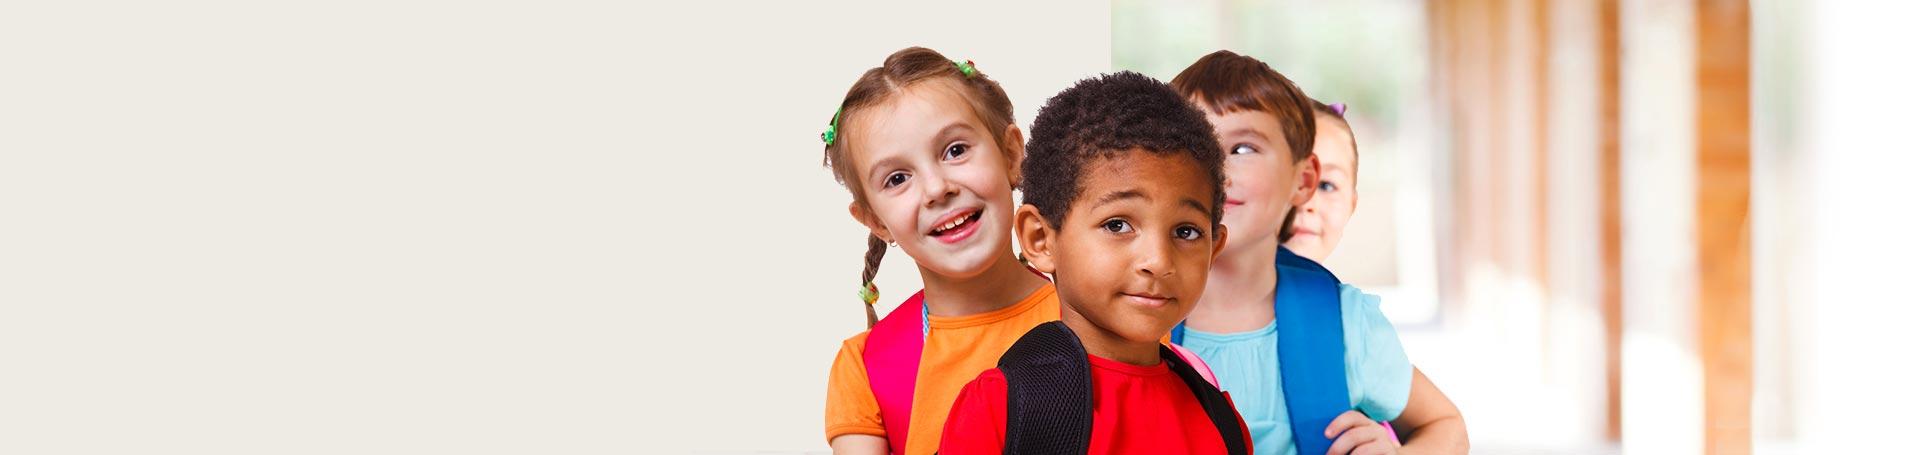 kids-at-school